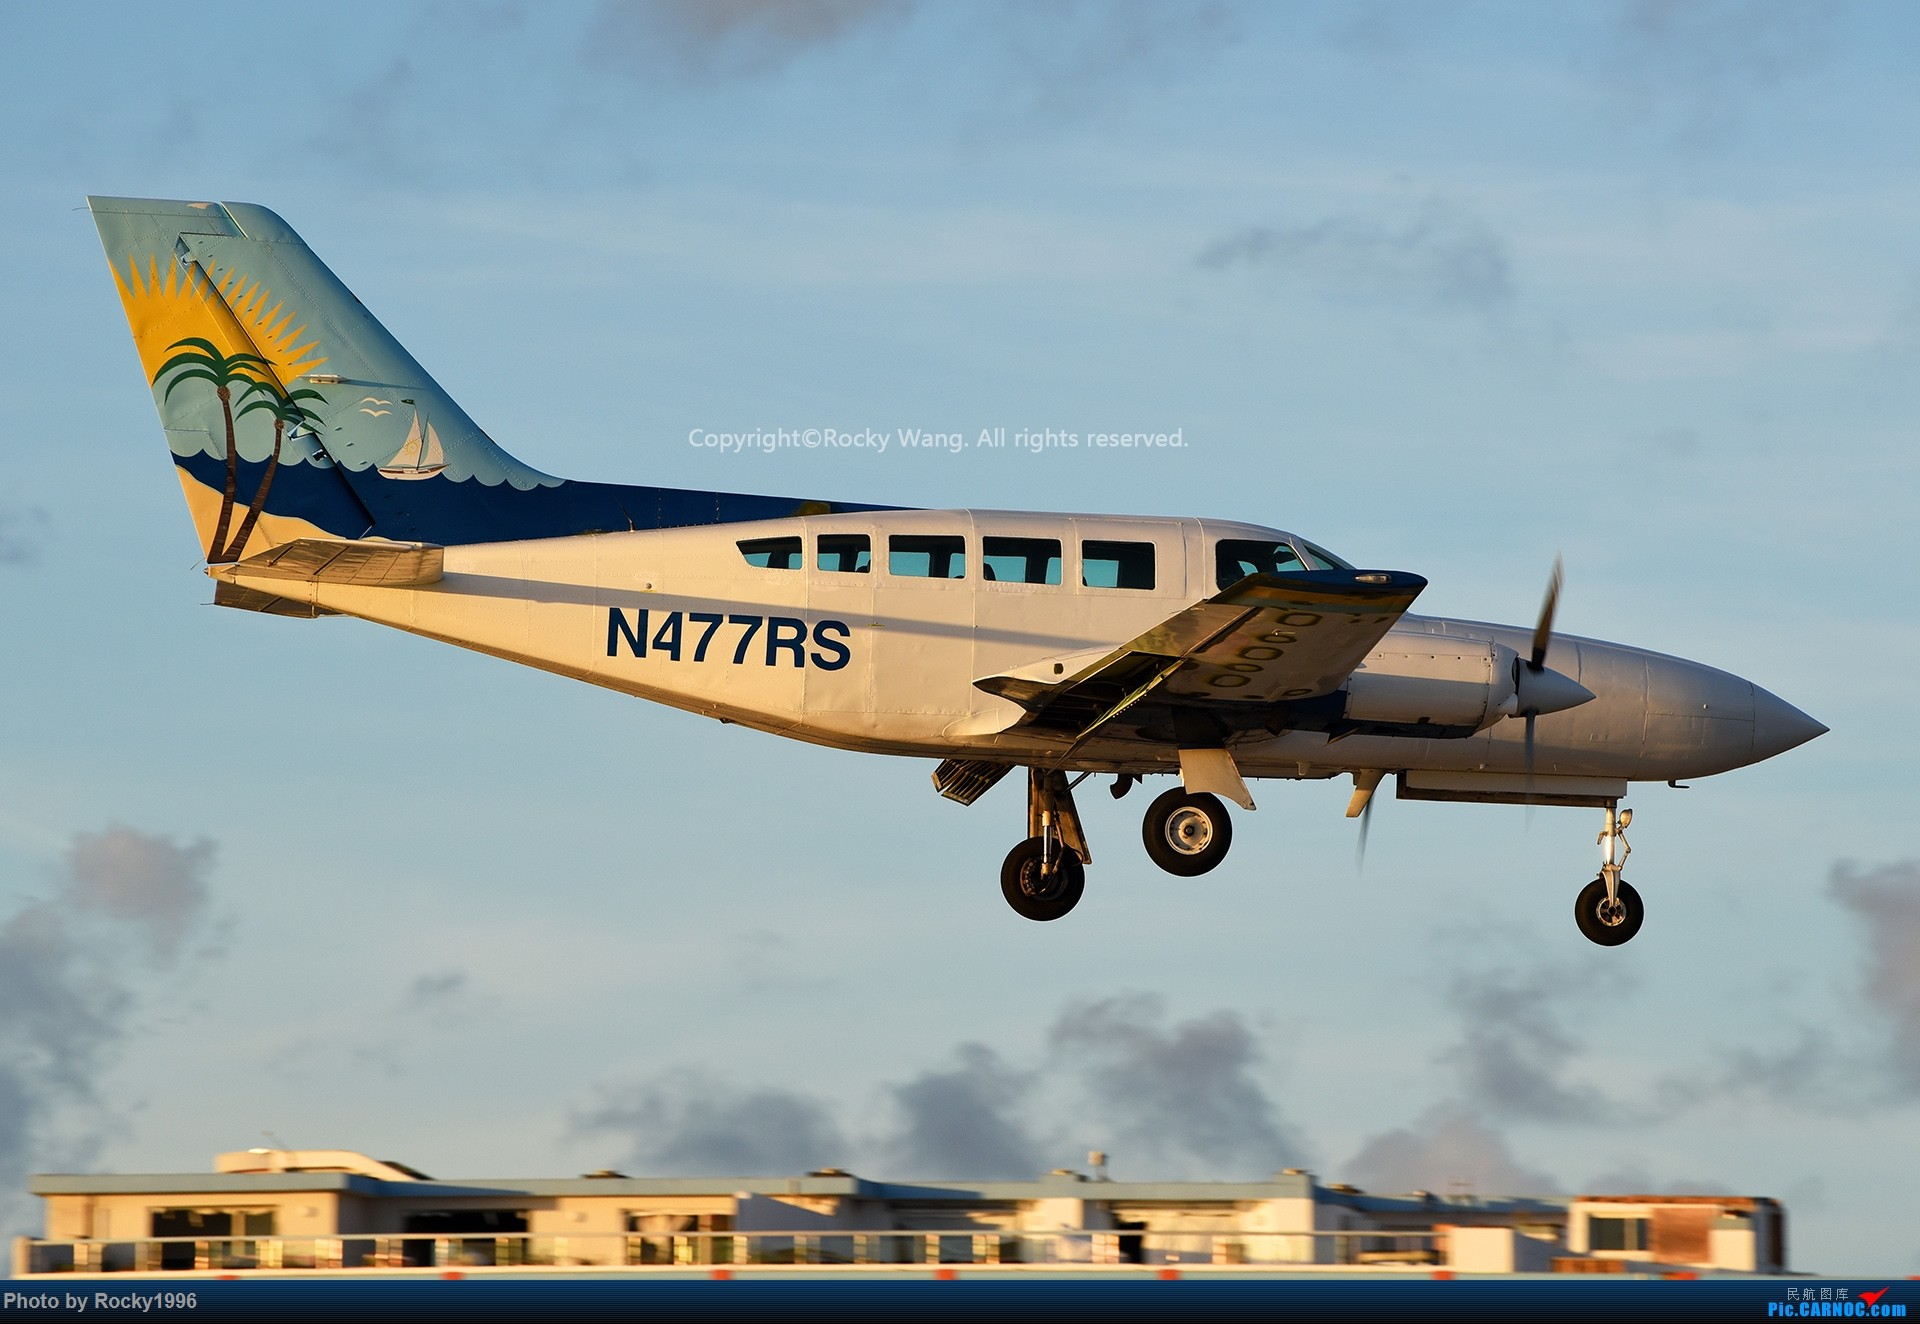 Re:[原创]My endless Caribbean dream——圣马丁朱莉安娜公主机场拍机记 CESSNA 402C N477RS 荷属安的列斯群岛朱利安娜公主机场